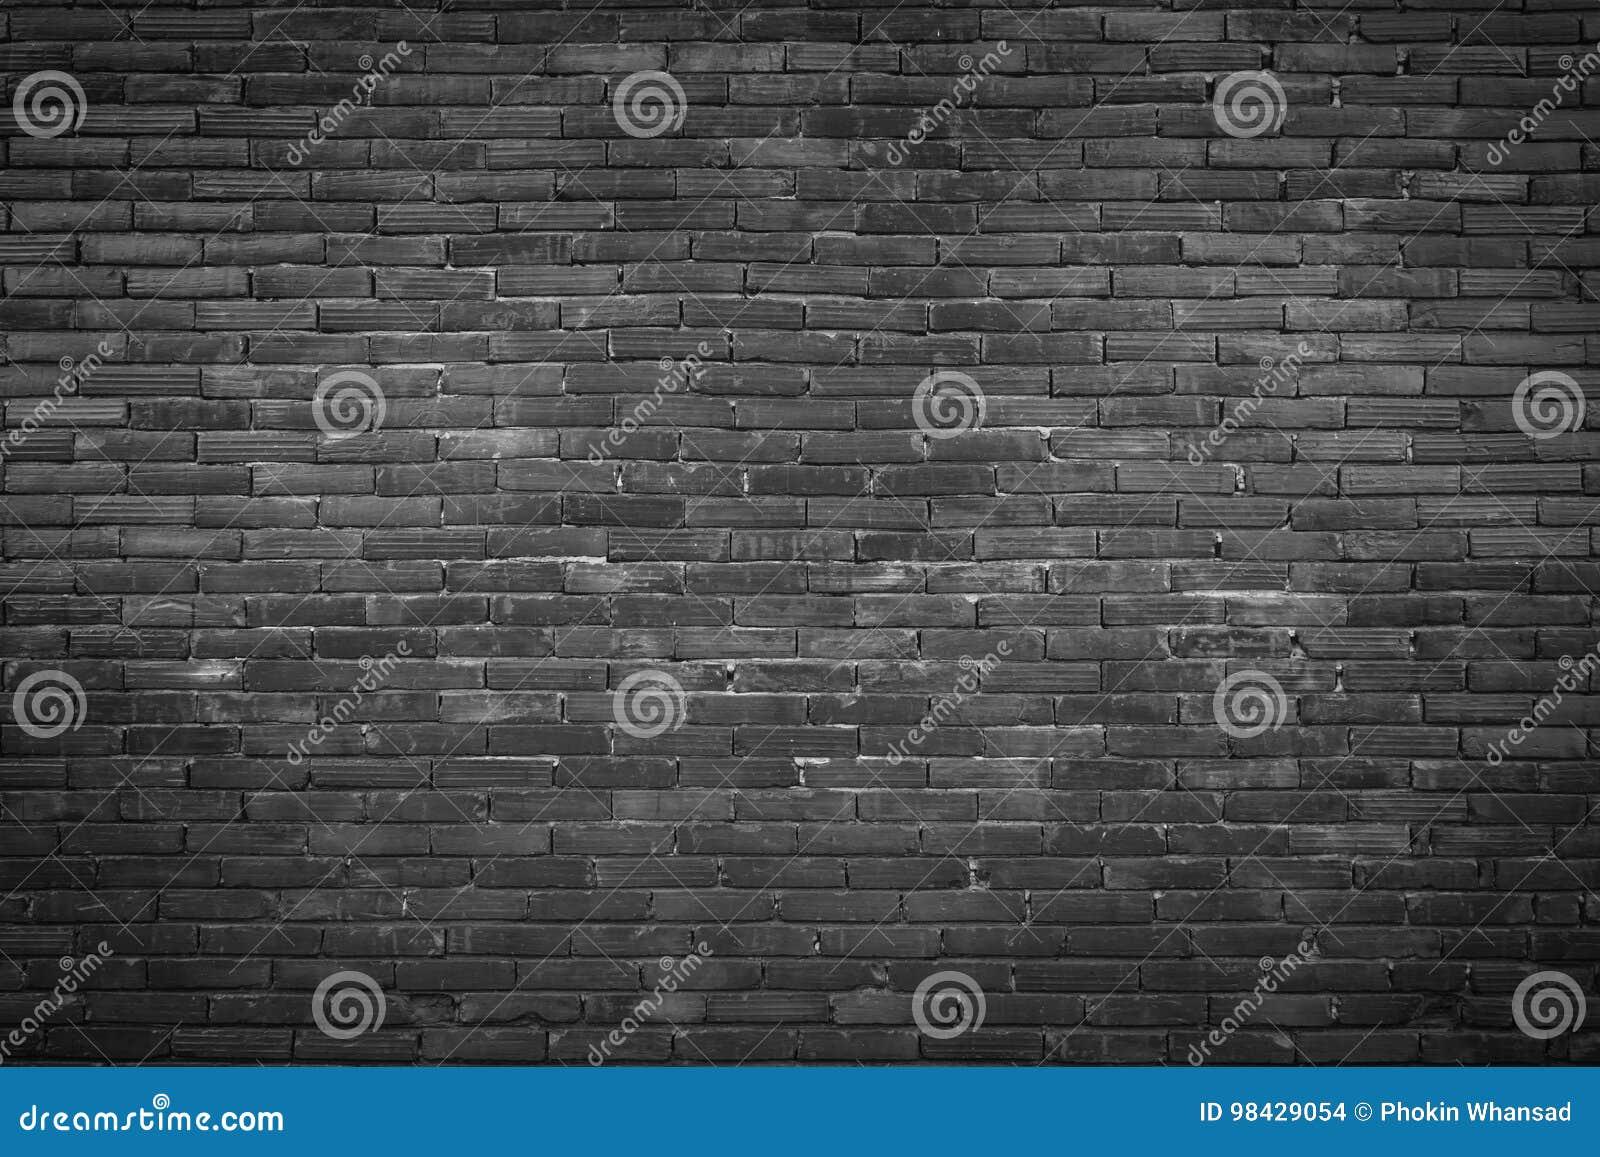 Pattern Stone Wall Background Brick Wallpaper Abstract